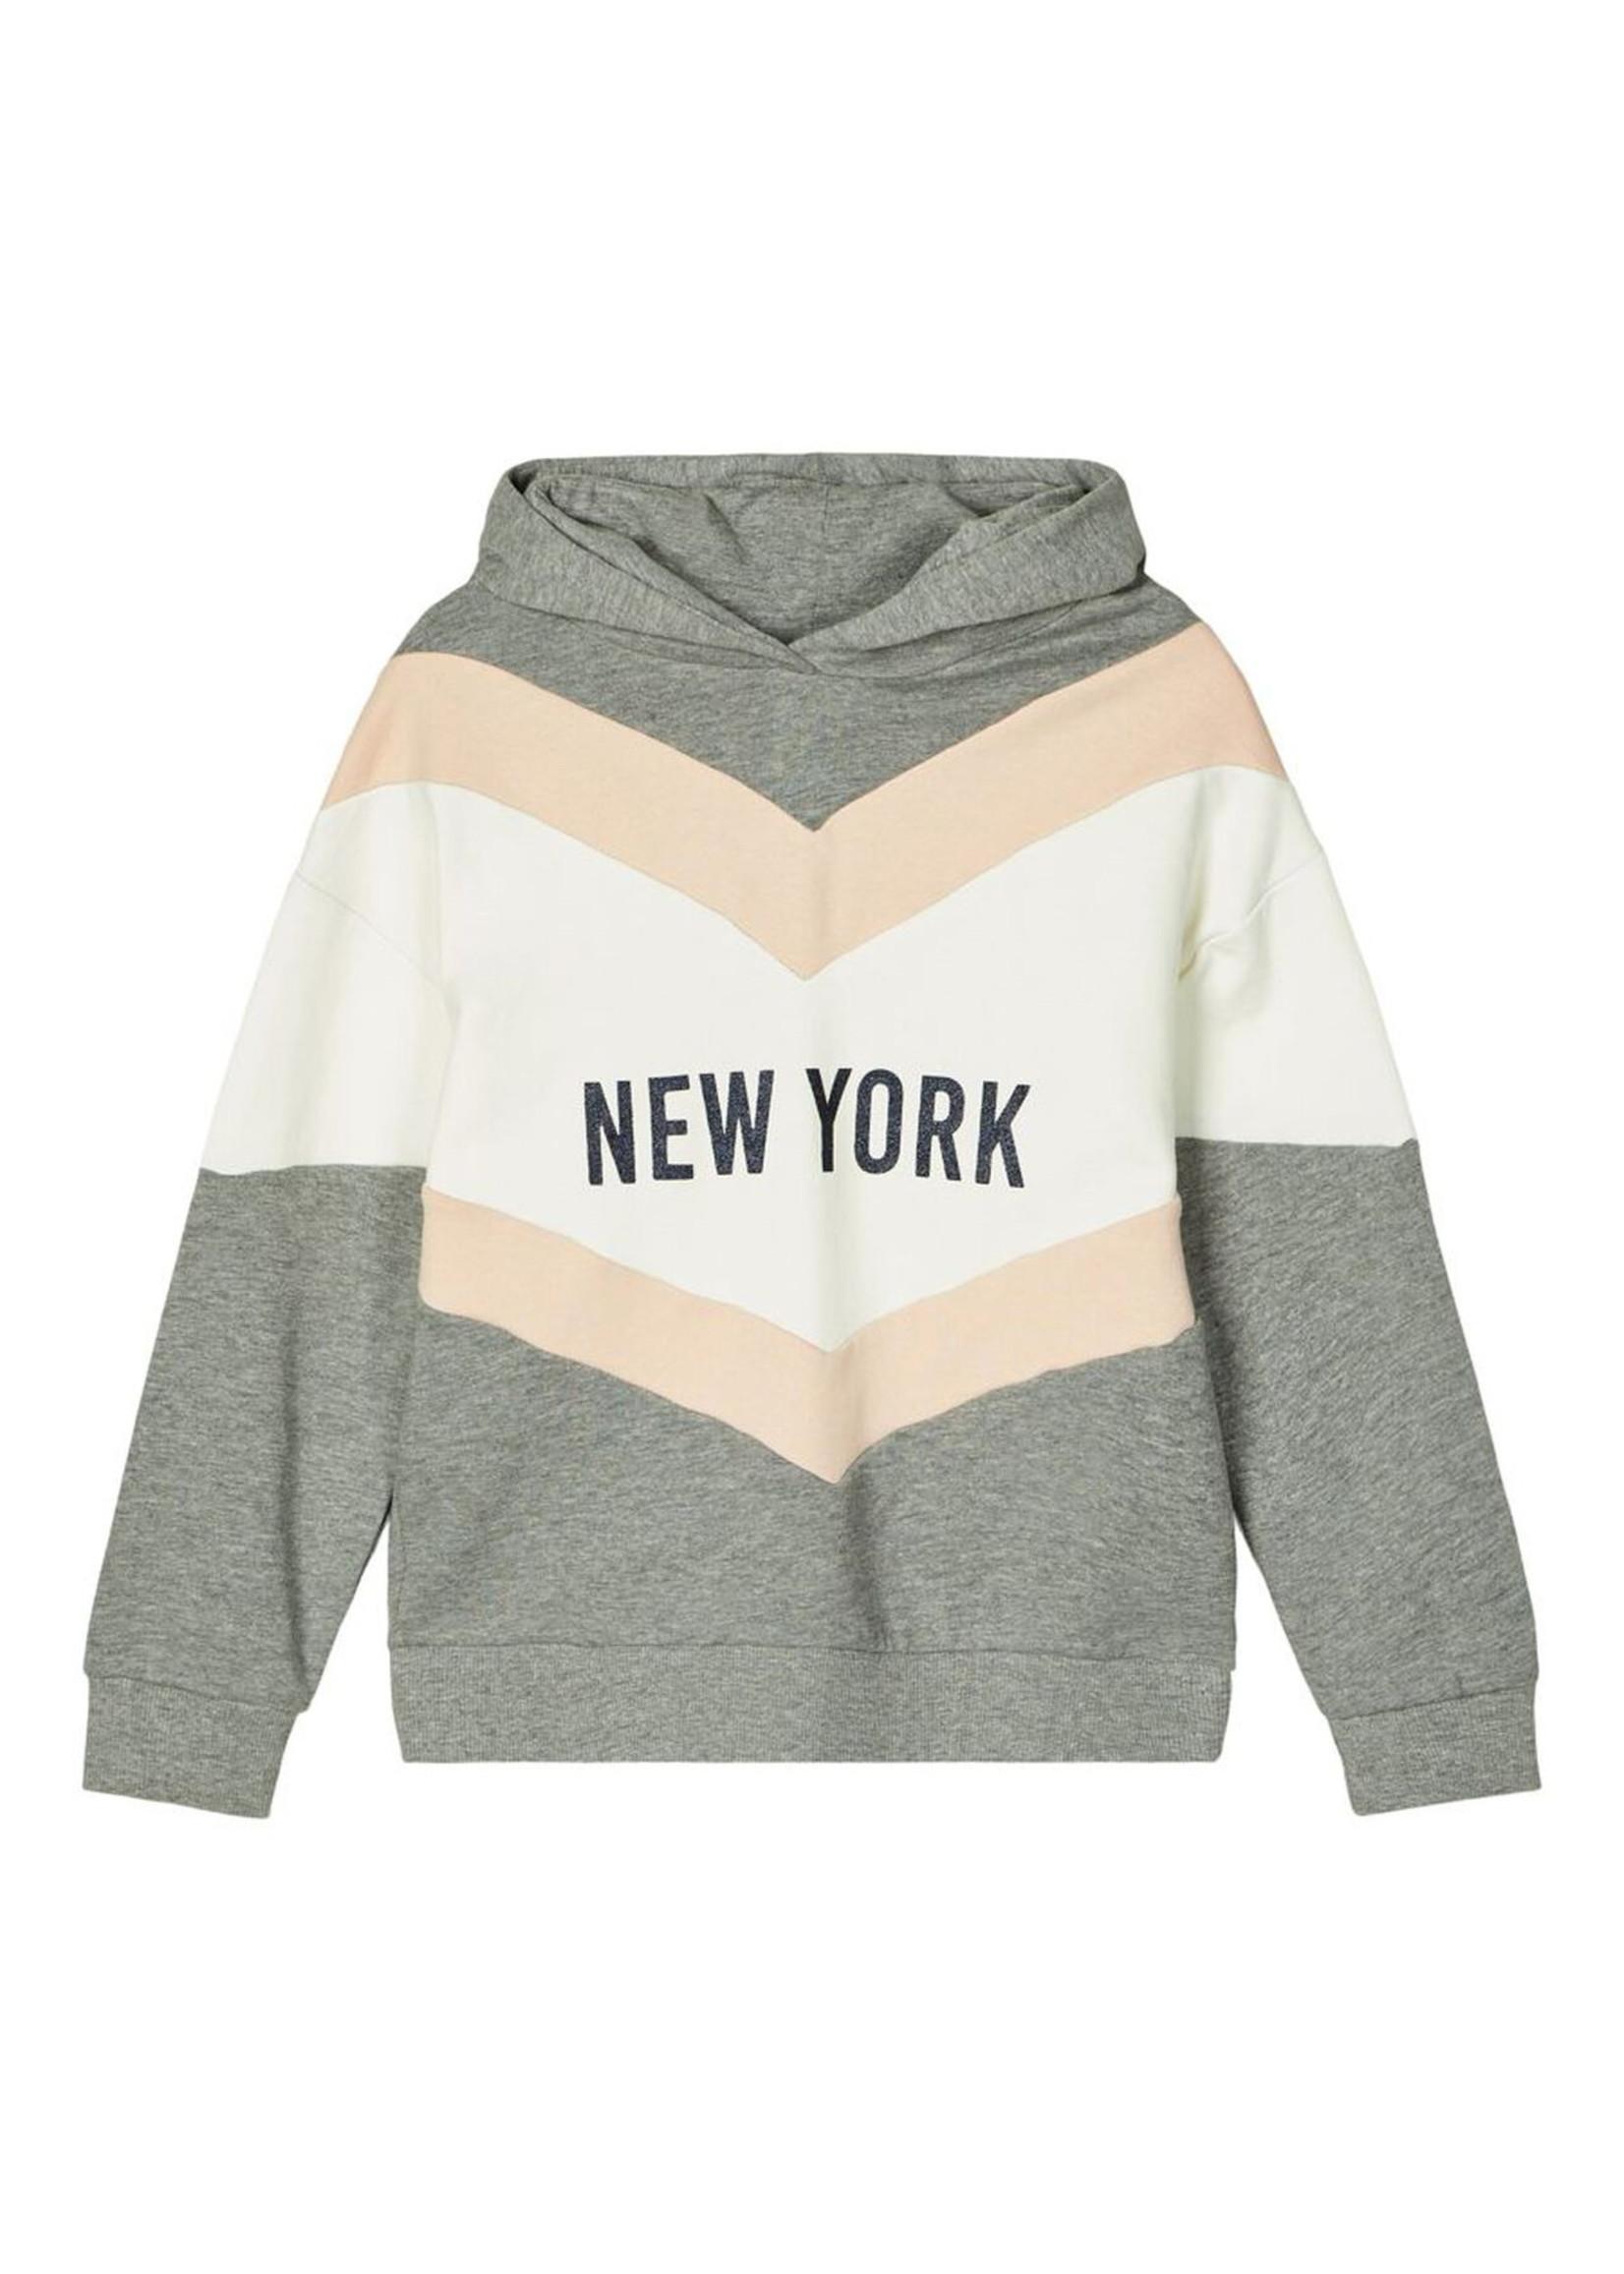 Name it hooded sweater maat 116 + 122/128